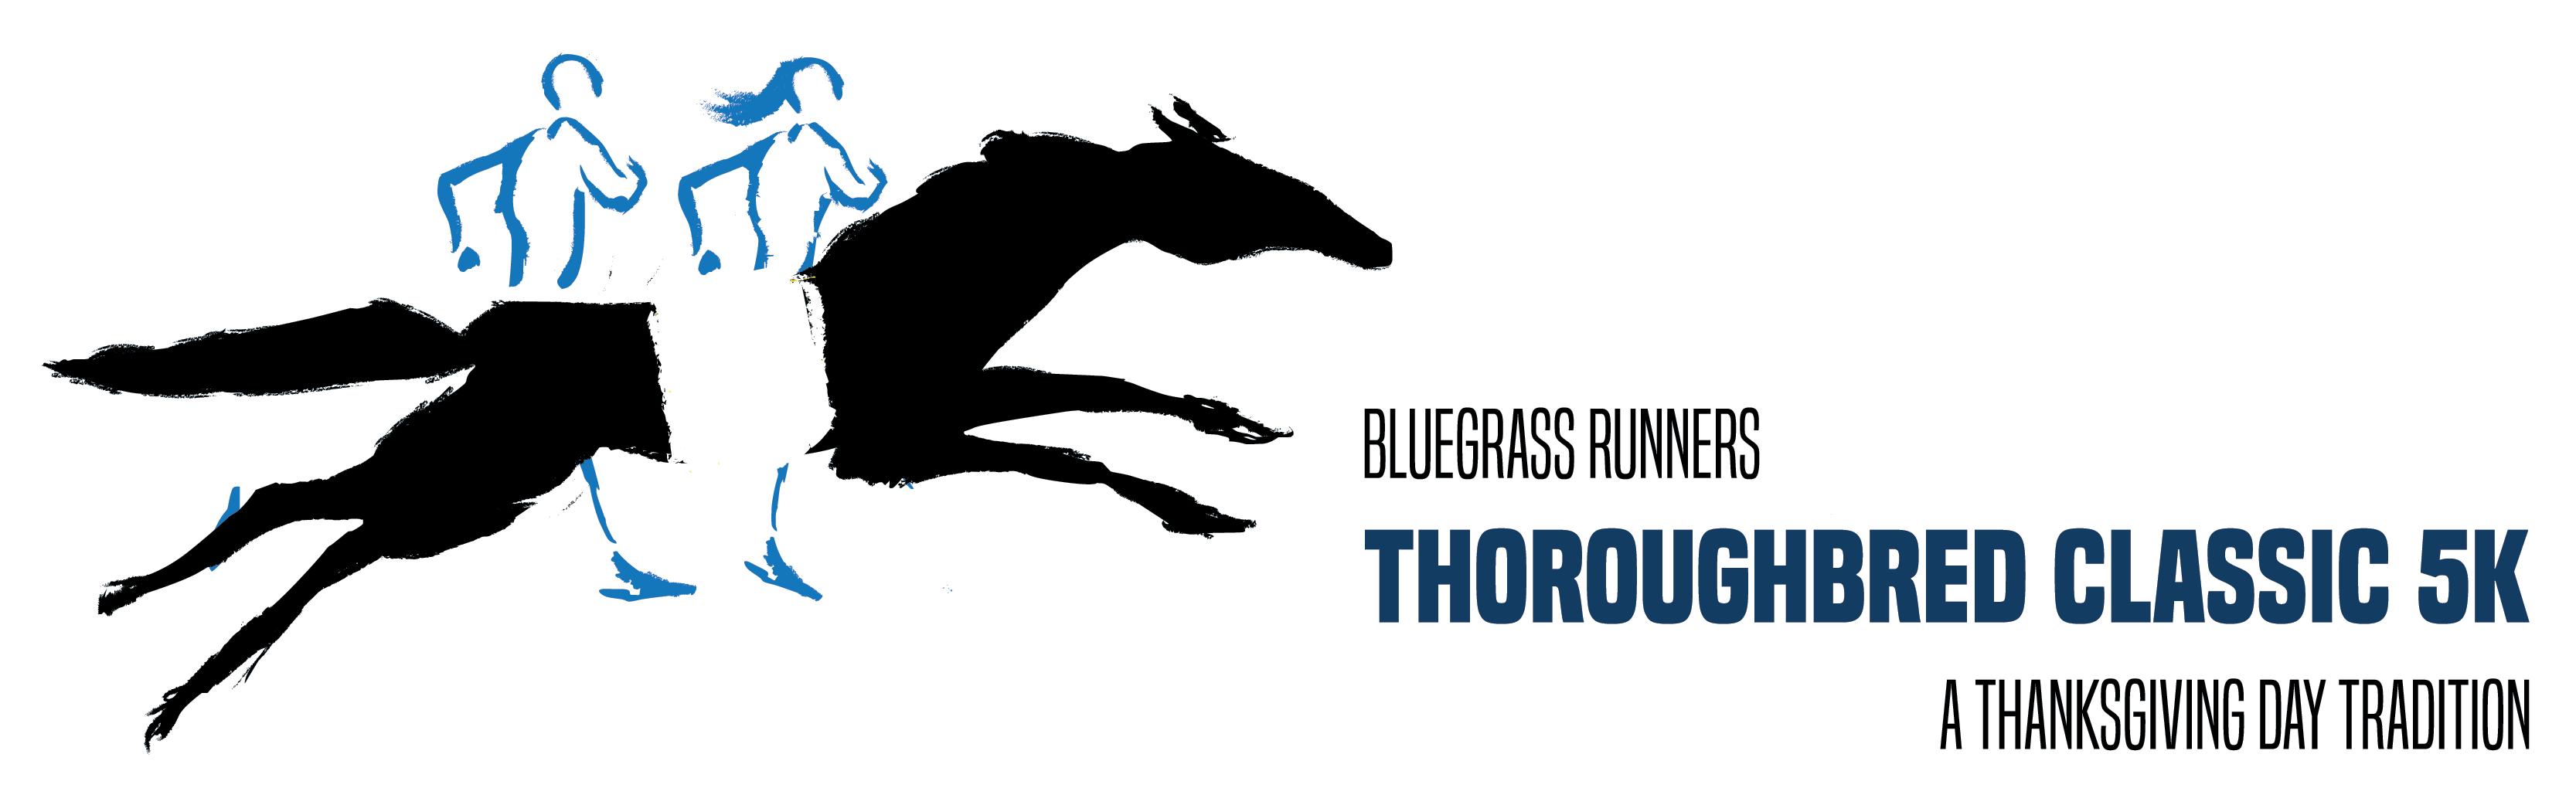 Bluegrass Runners Thoroughbred Classic 5K